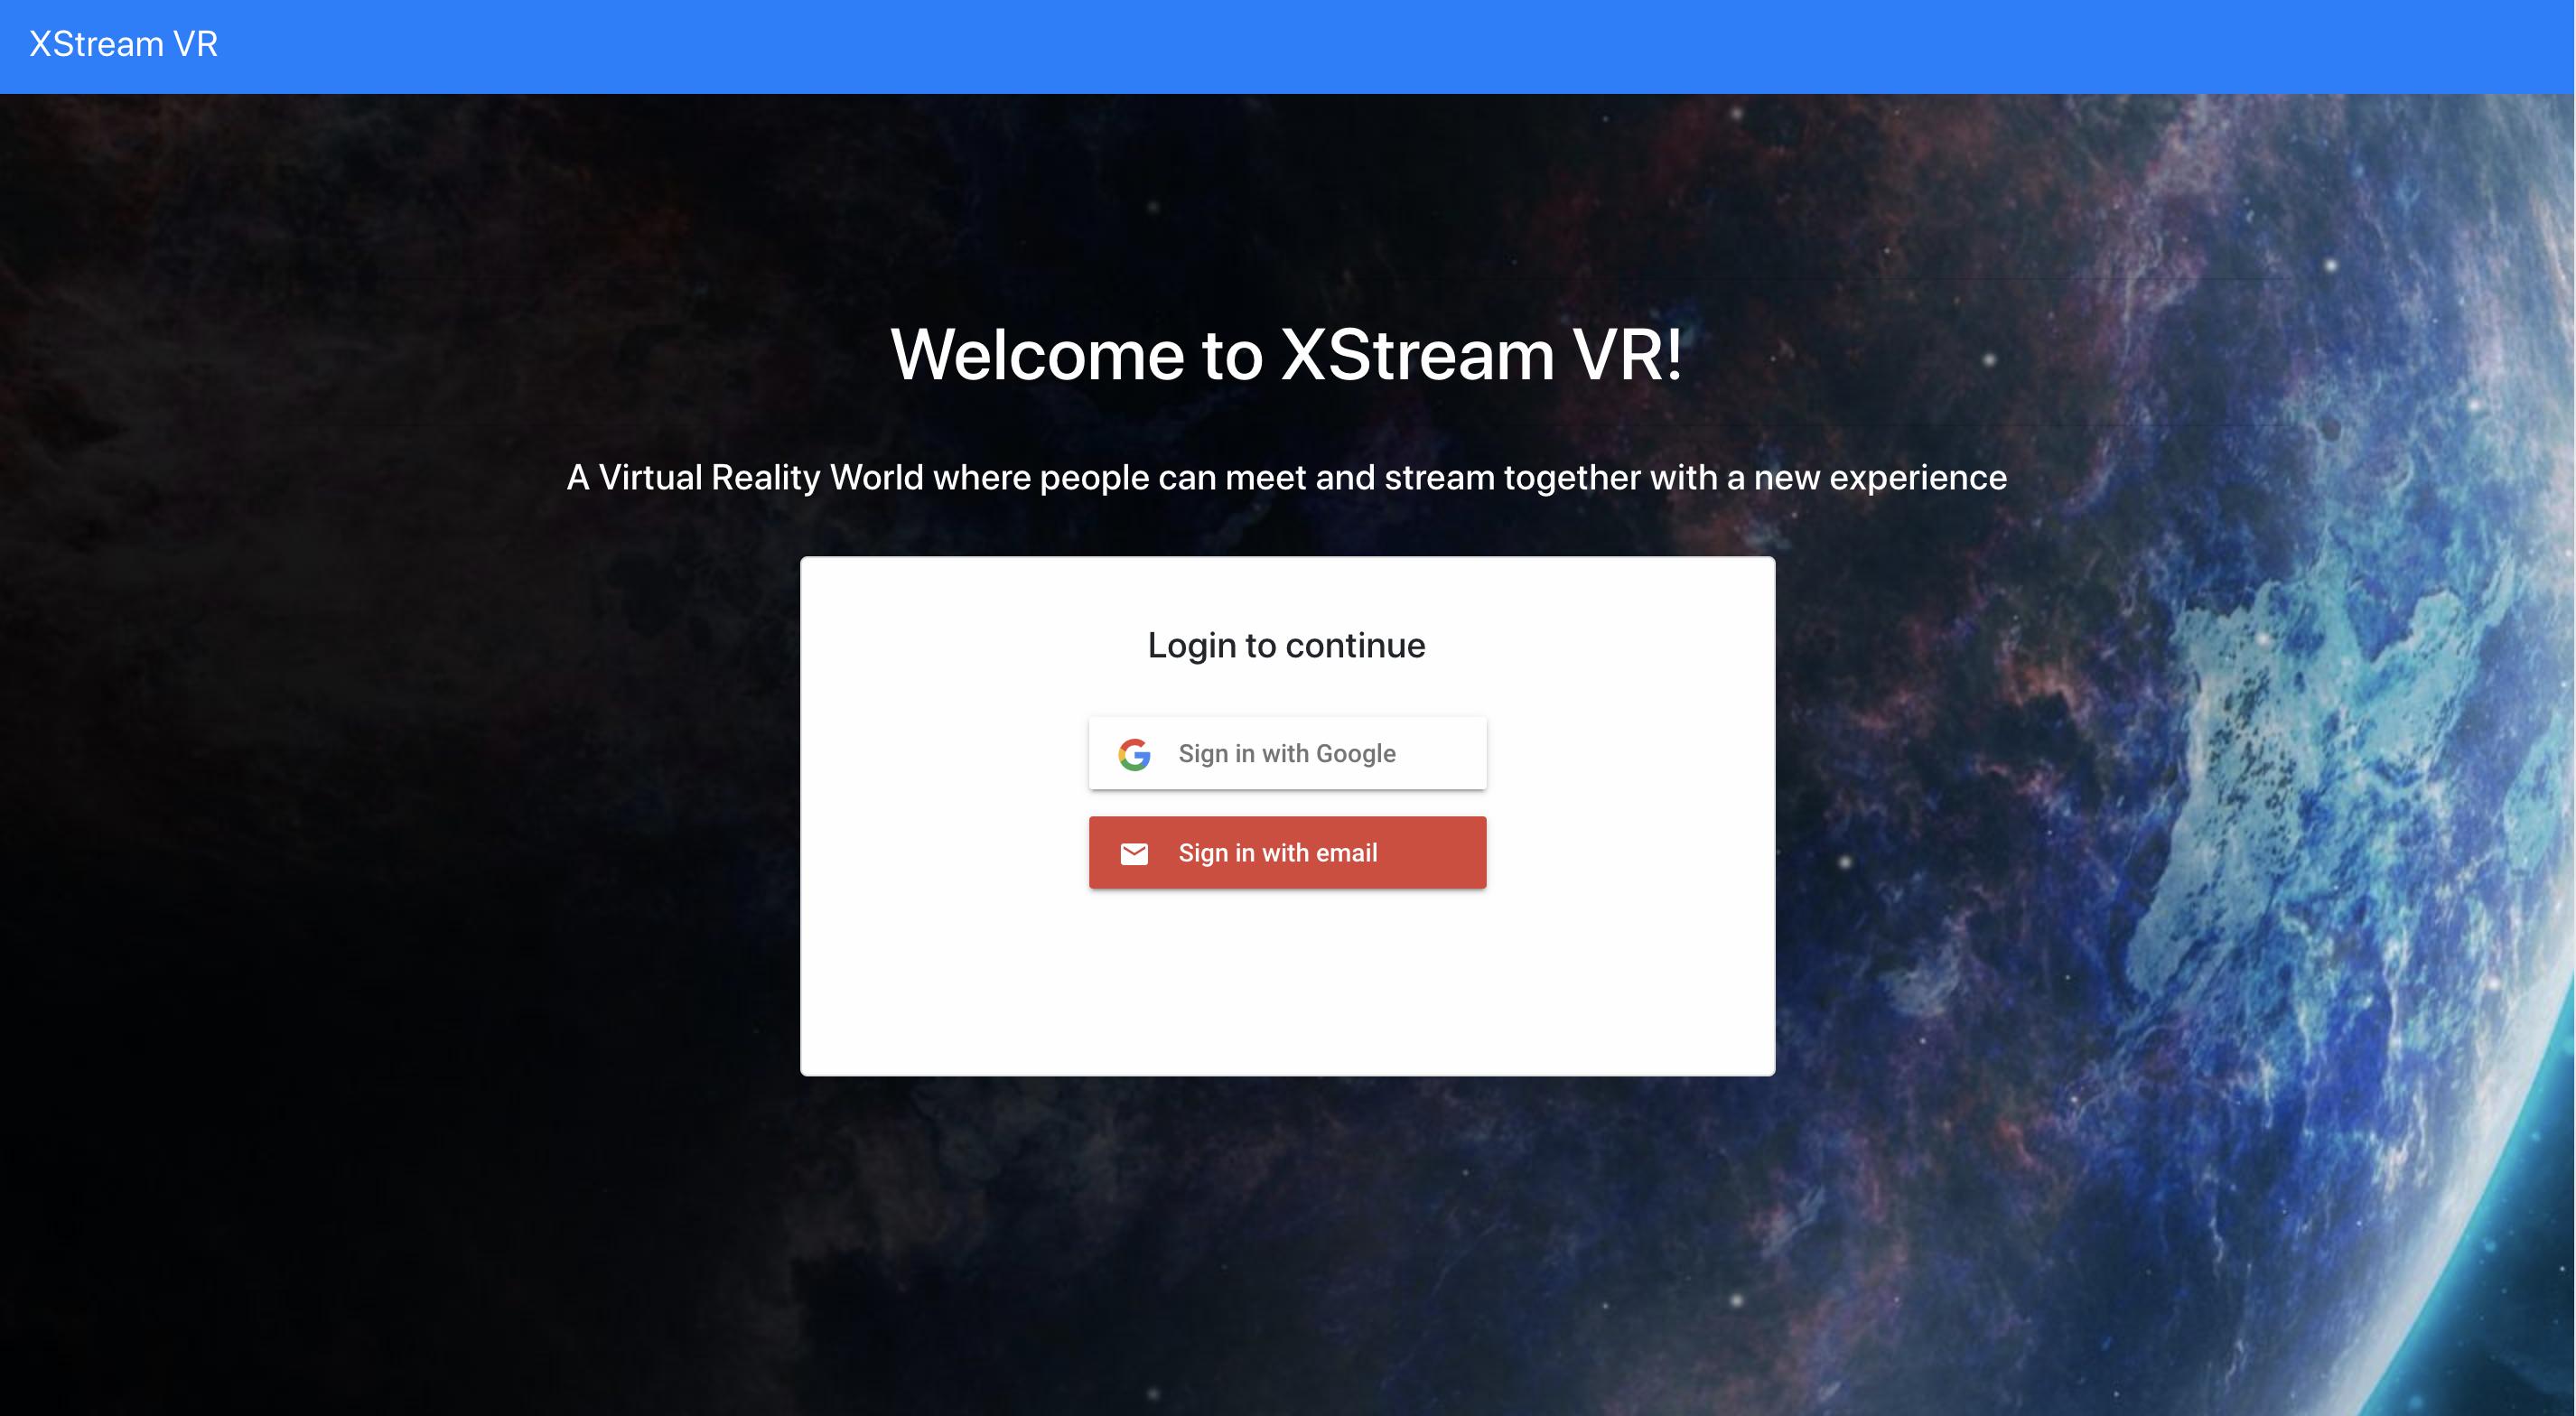 XStream VR